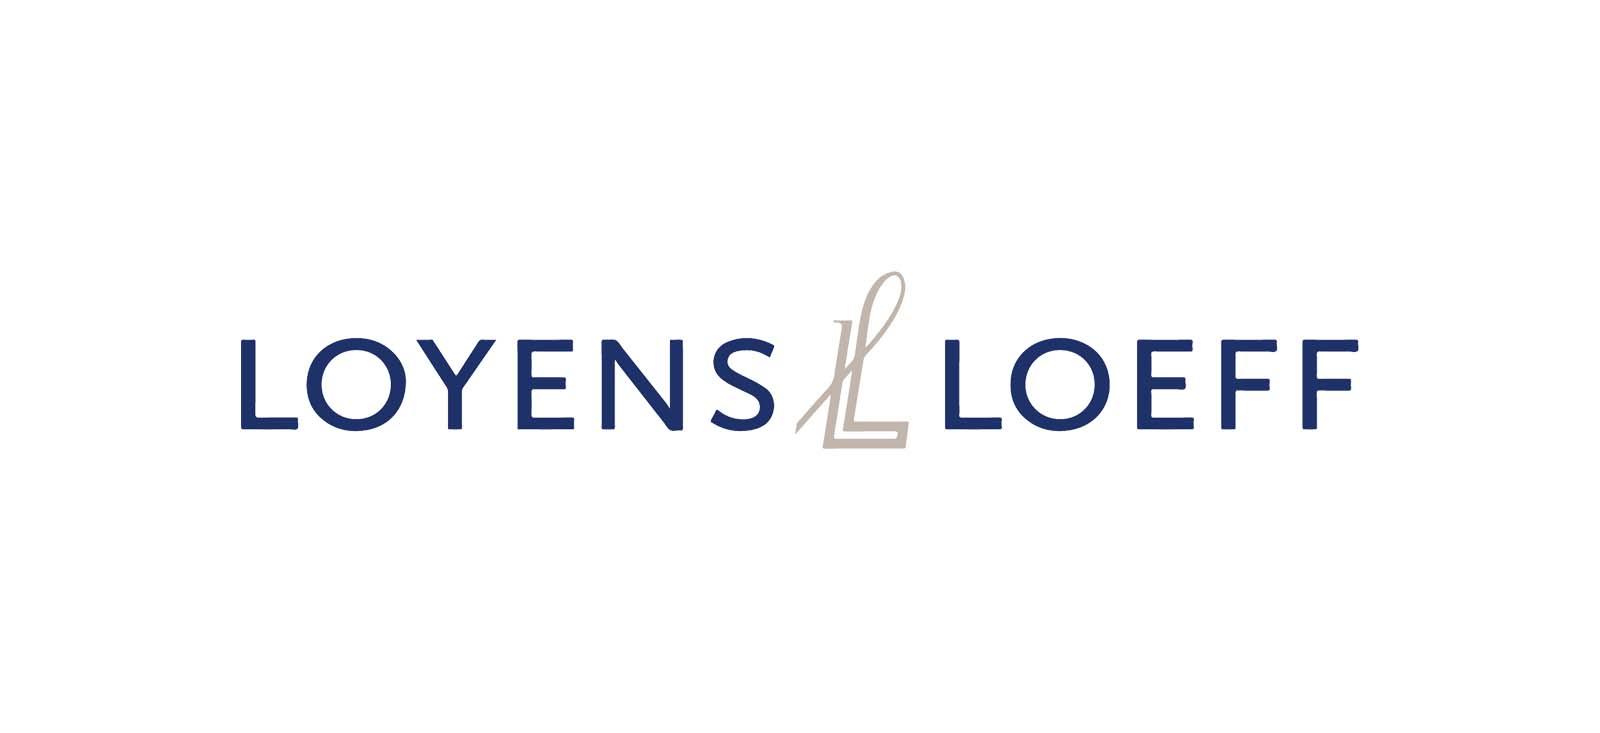 Loyens&Loeff